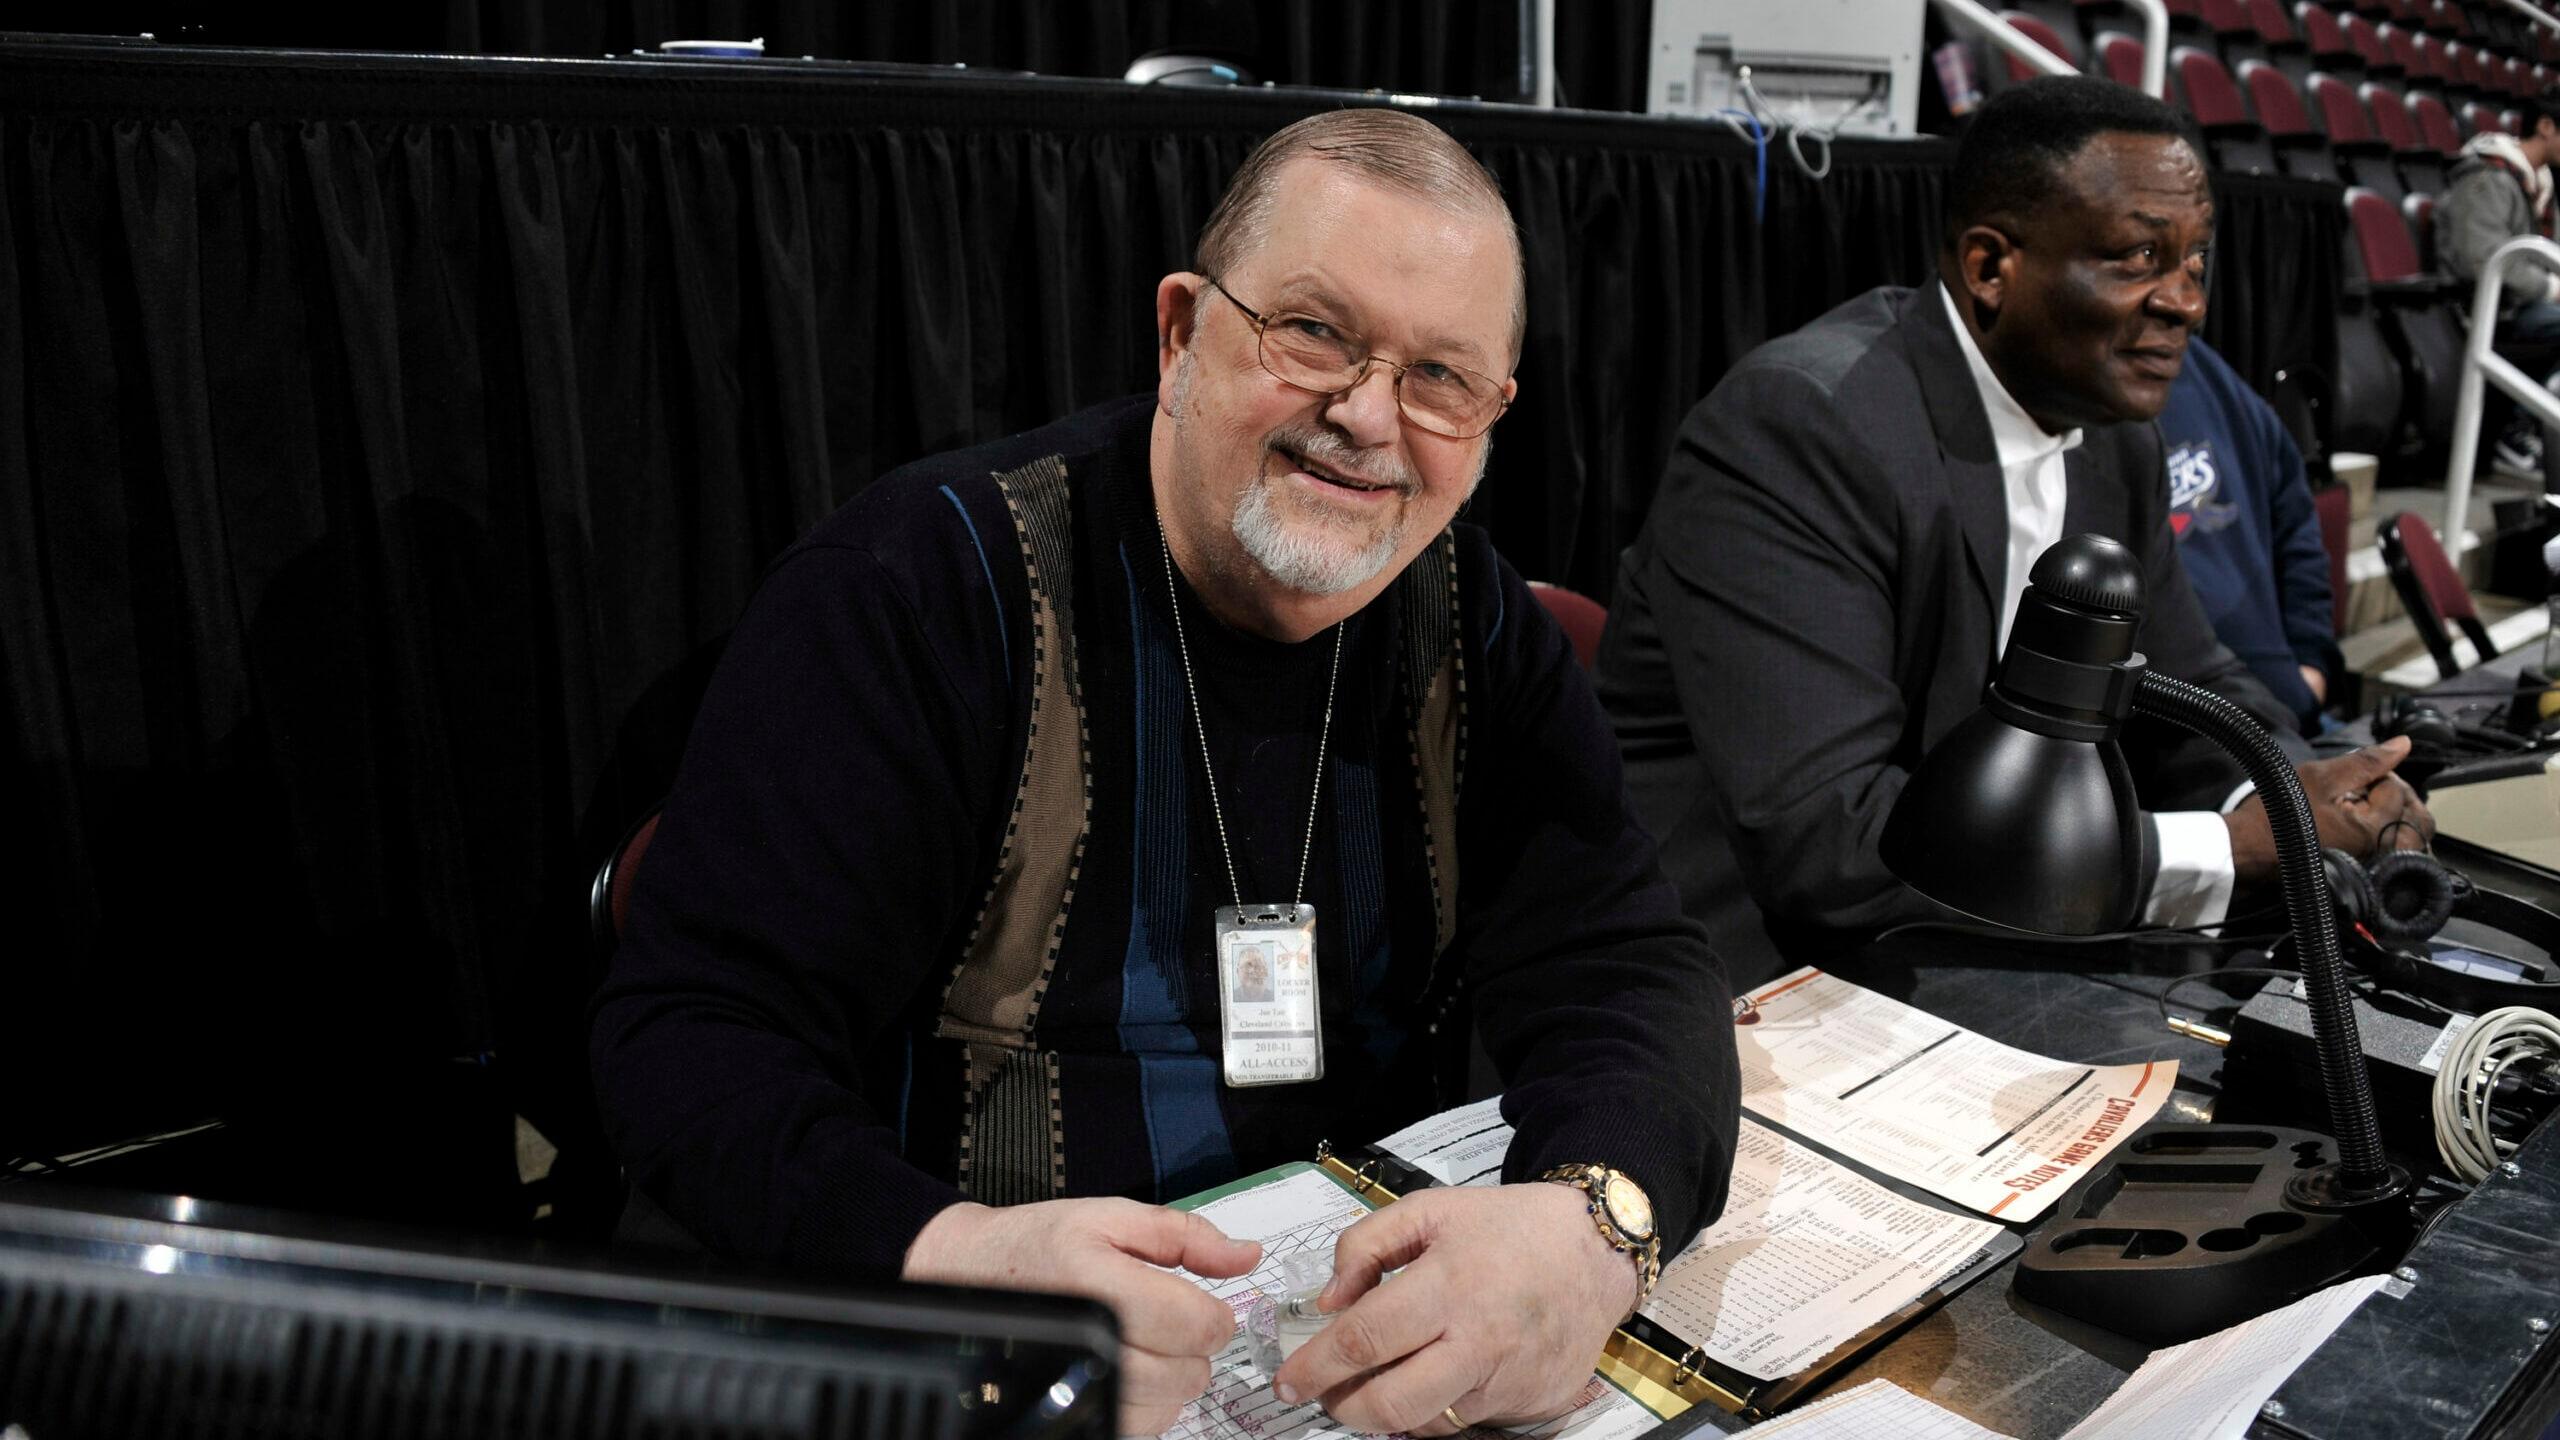 Longtime Cavaliers broadcaster Joe Tait dies at 83